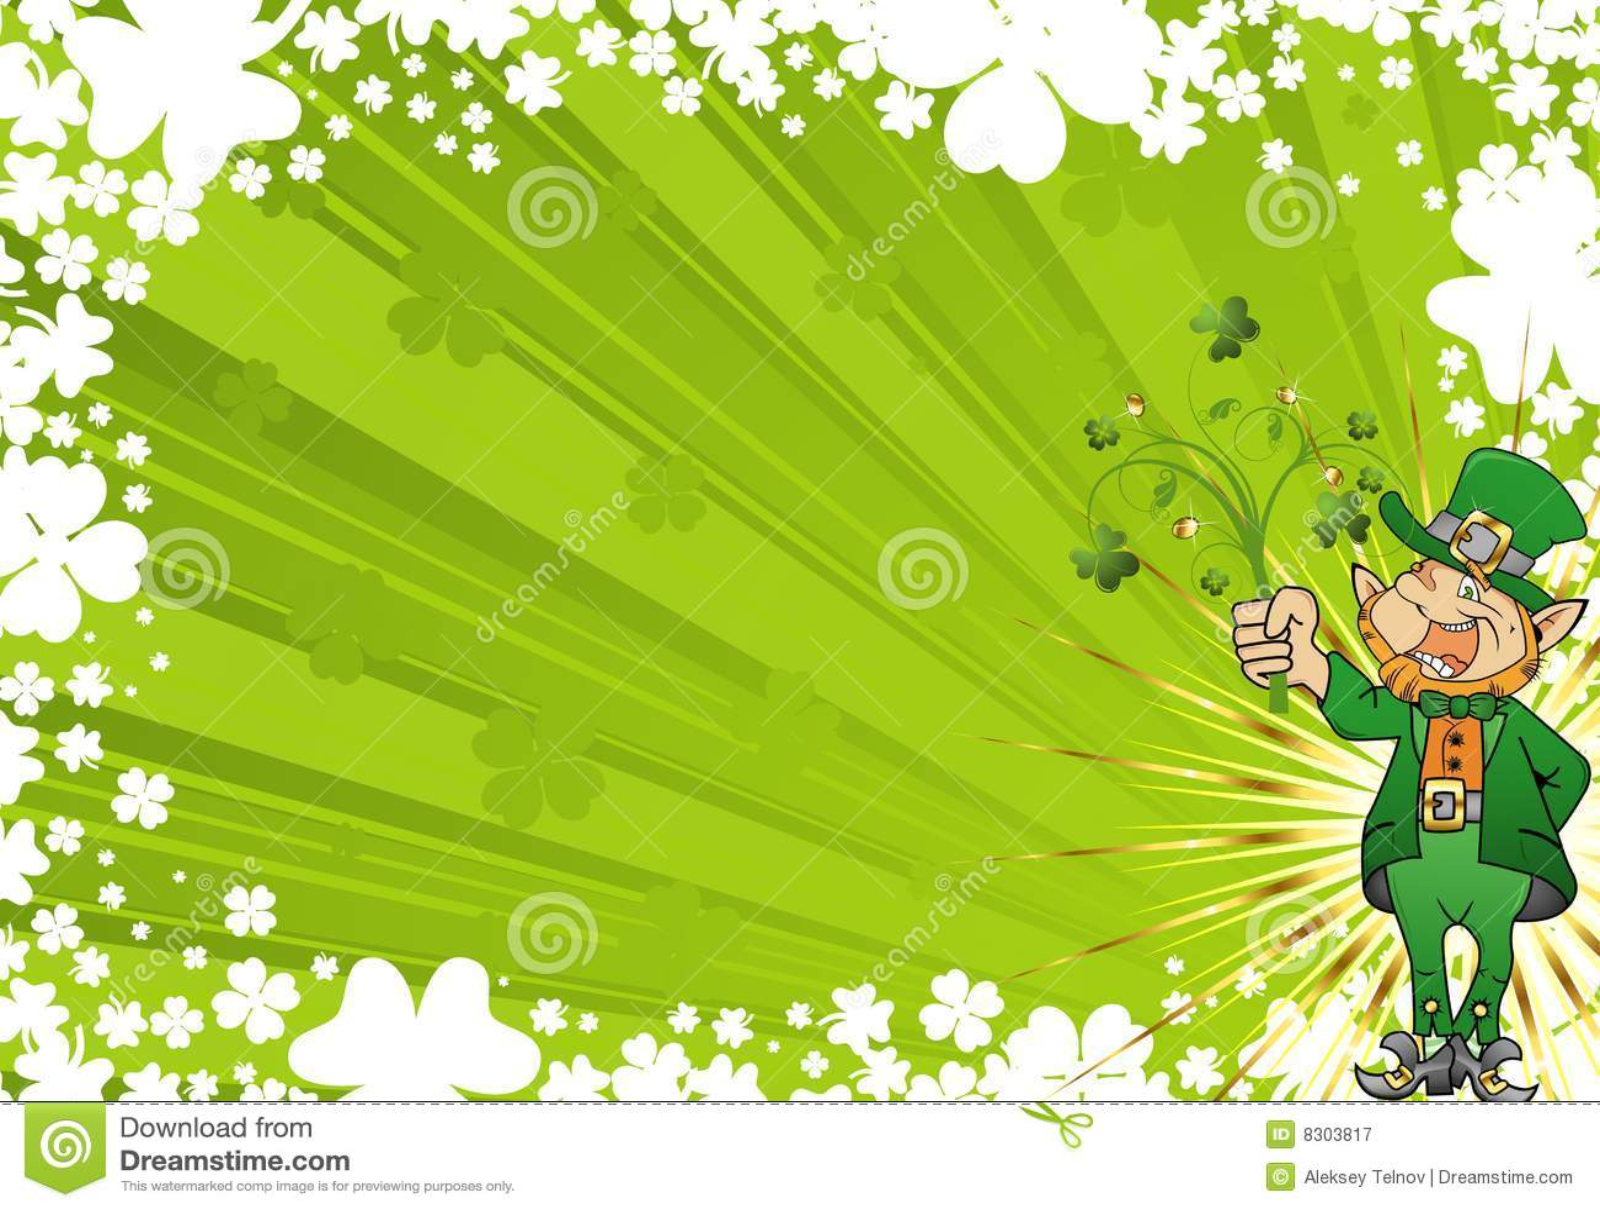 St Patricks Day Free Vector Art 3953 S